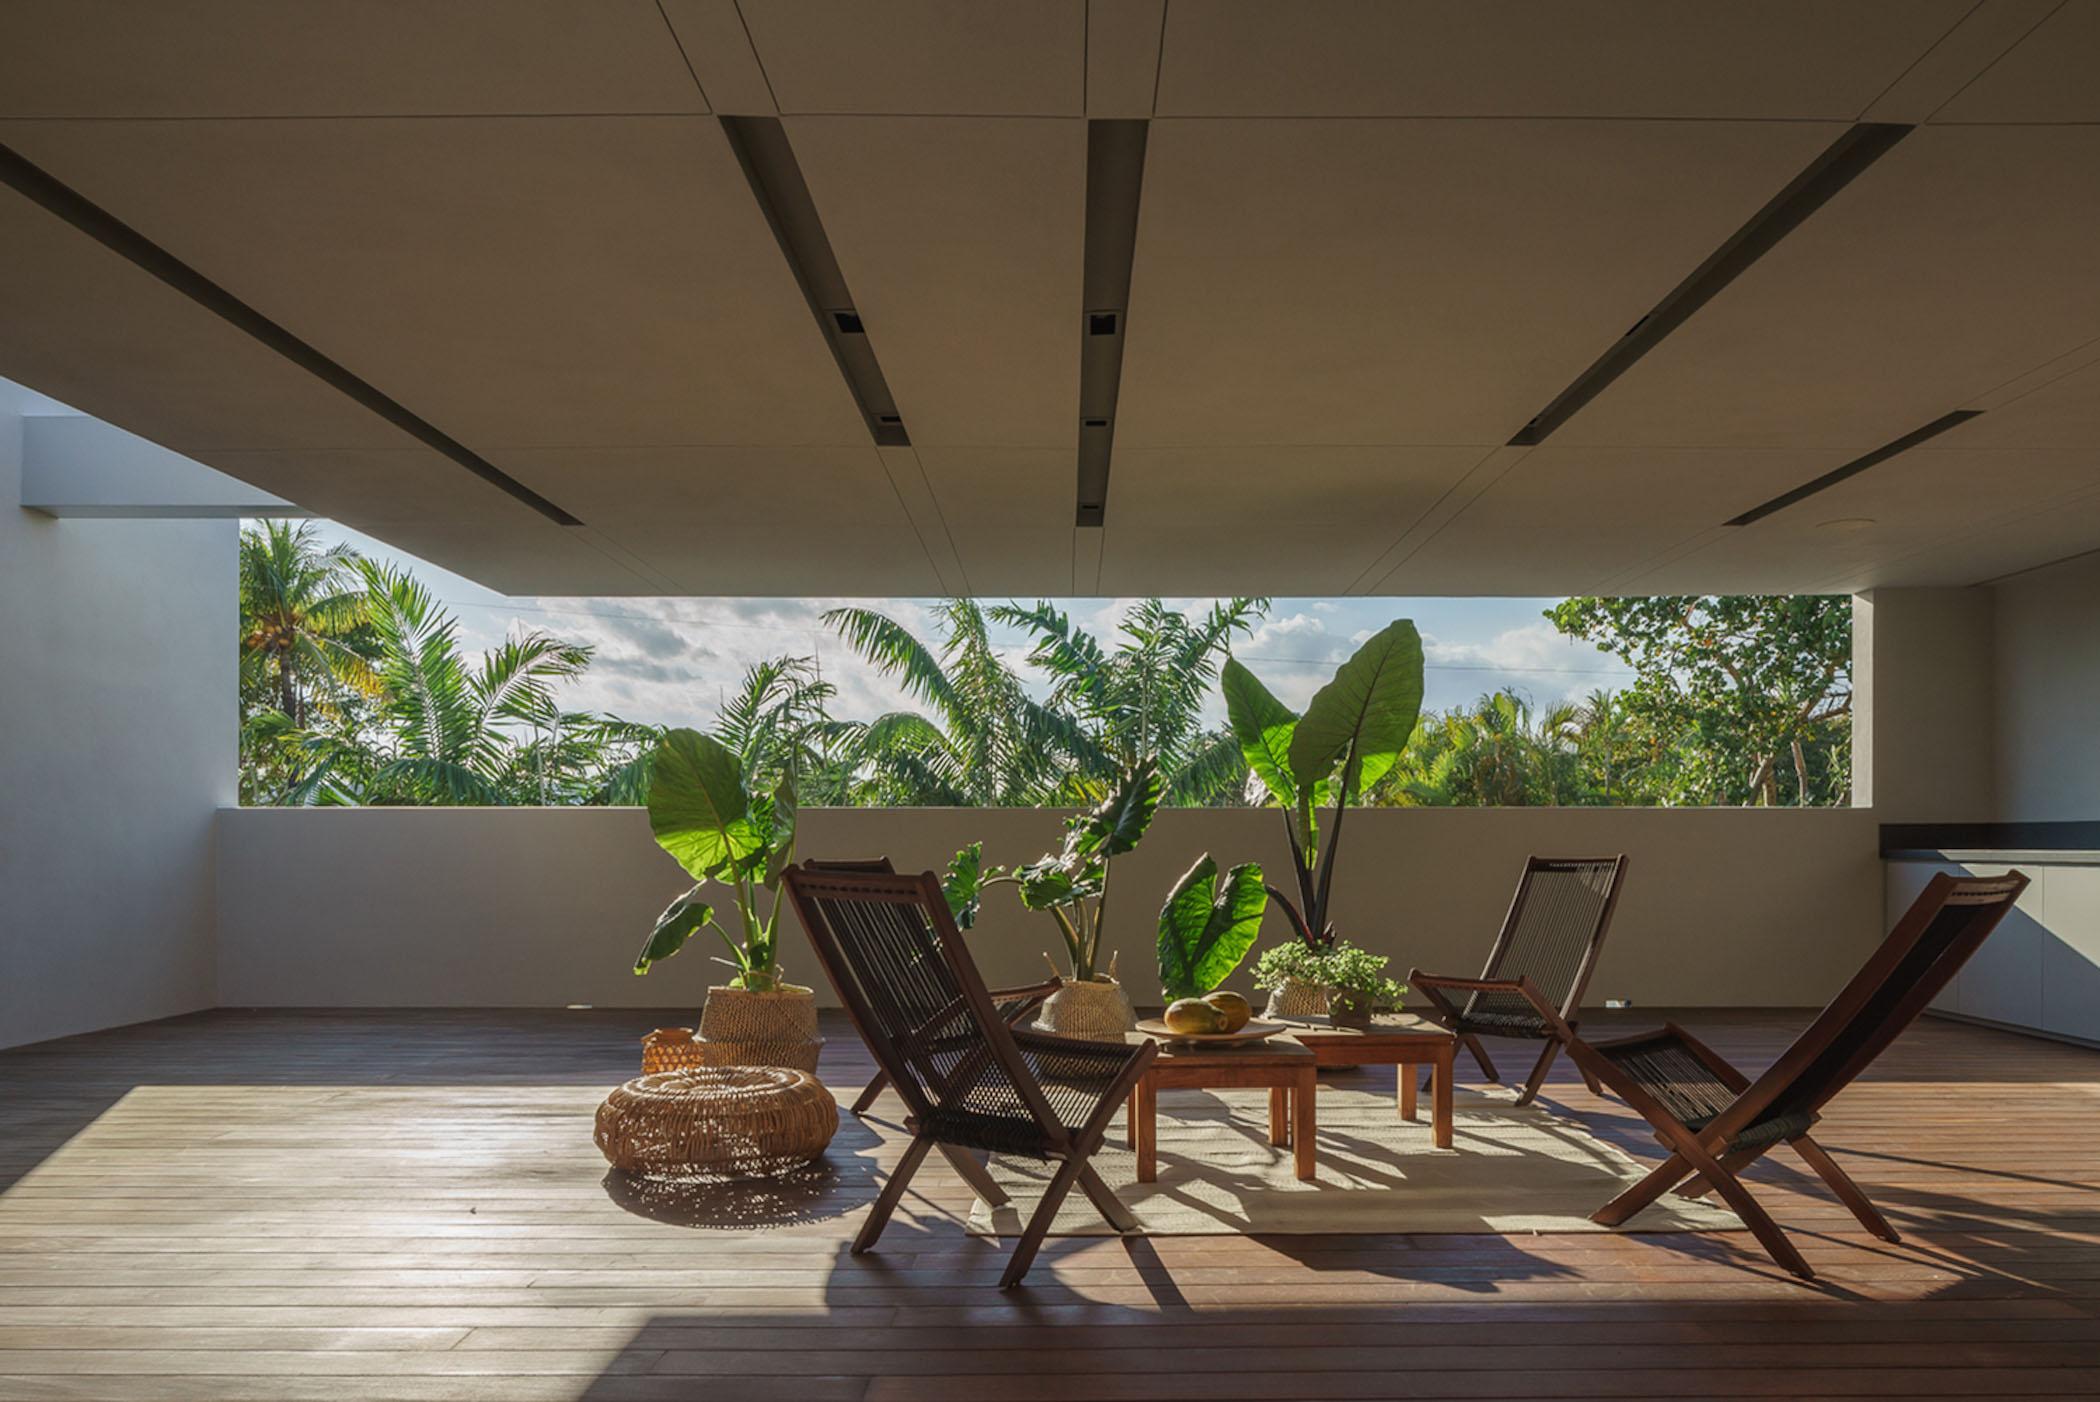 iGNANT_Architecture_Ron_Rojas_House_Rene_Gonzalez_Architect06